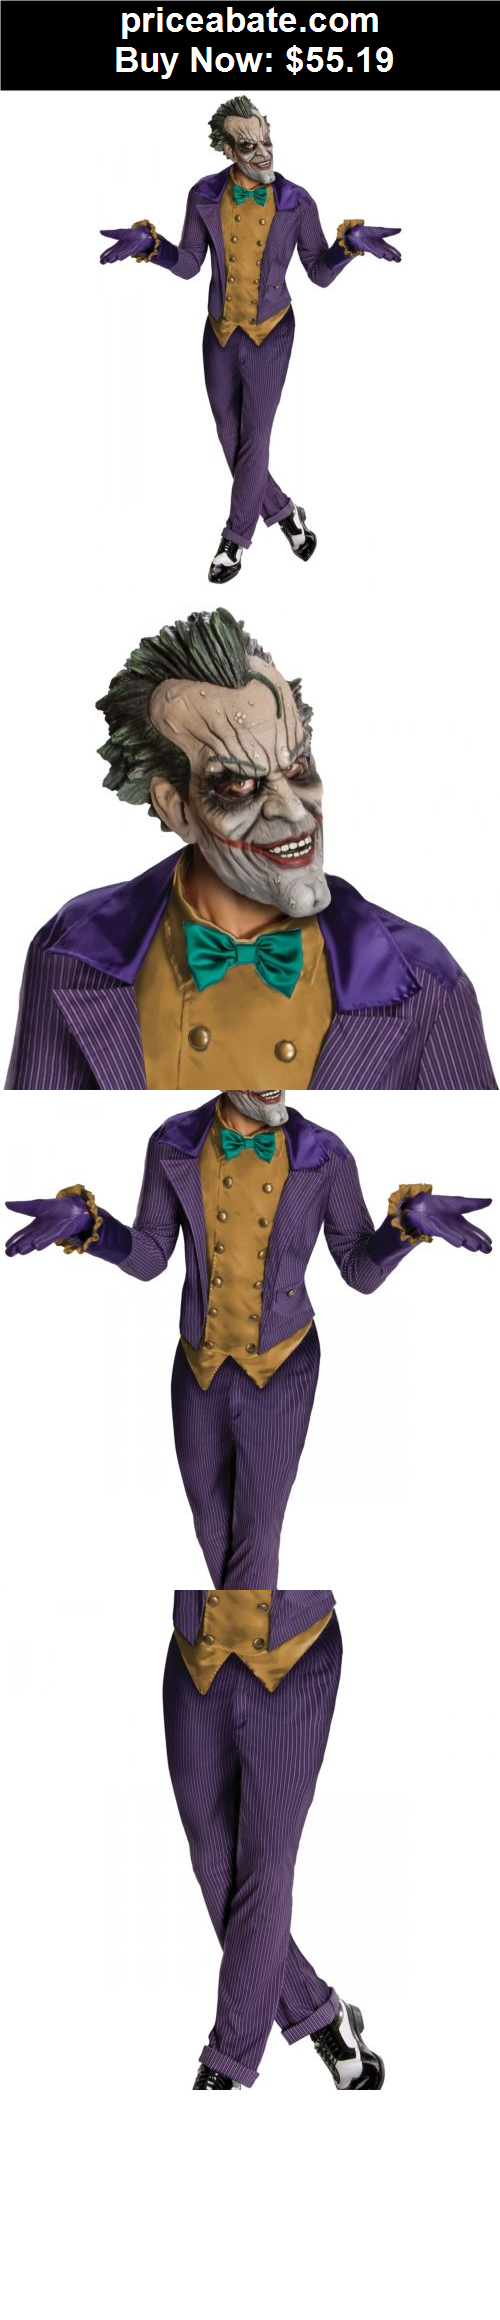 Men-Costumes Joker Costume Adult Batman Arkham City Superhero Villain Halloween Fancy Dress -  sc 1 st  Pinterest & Men-Costumes: Joker Costume Adult Batman Arkham City Superhero ...